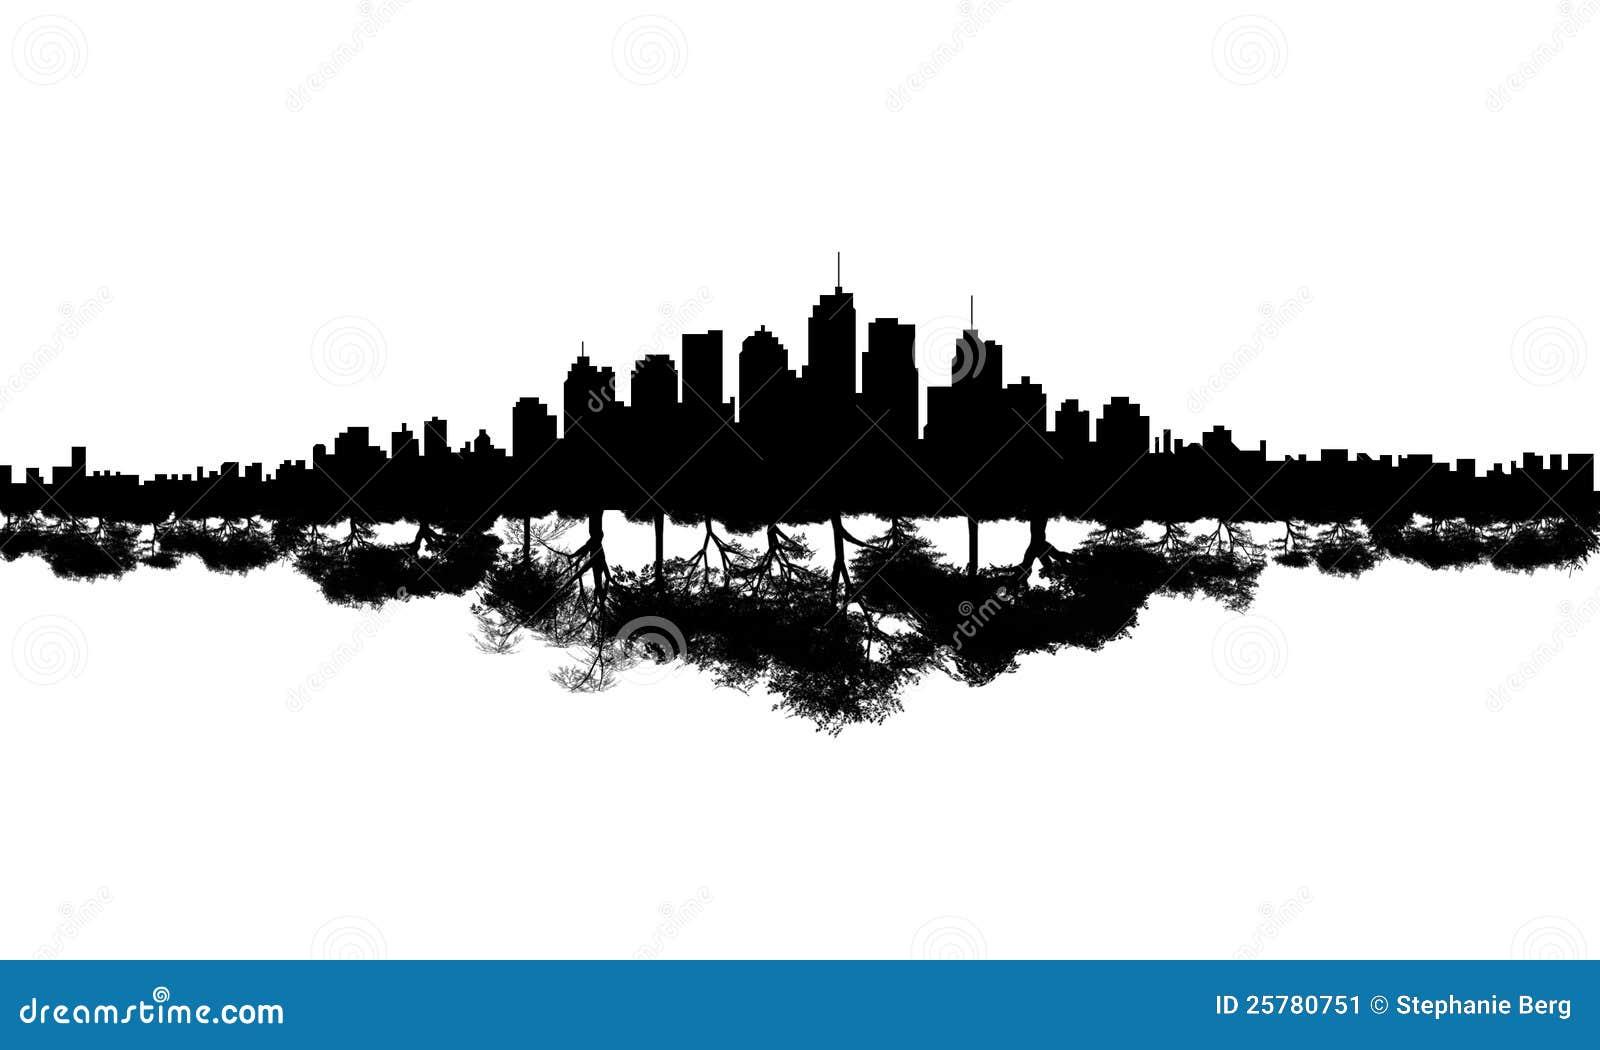 City Skyline Tree Reflection Stock Image  25780751